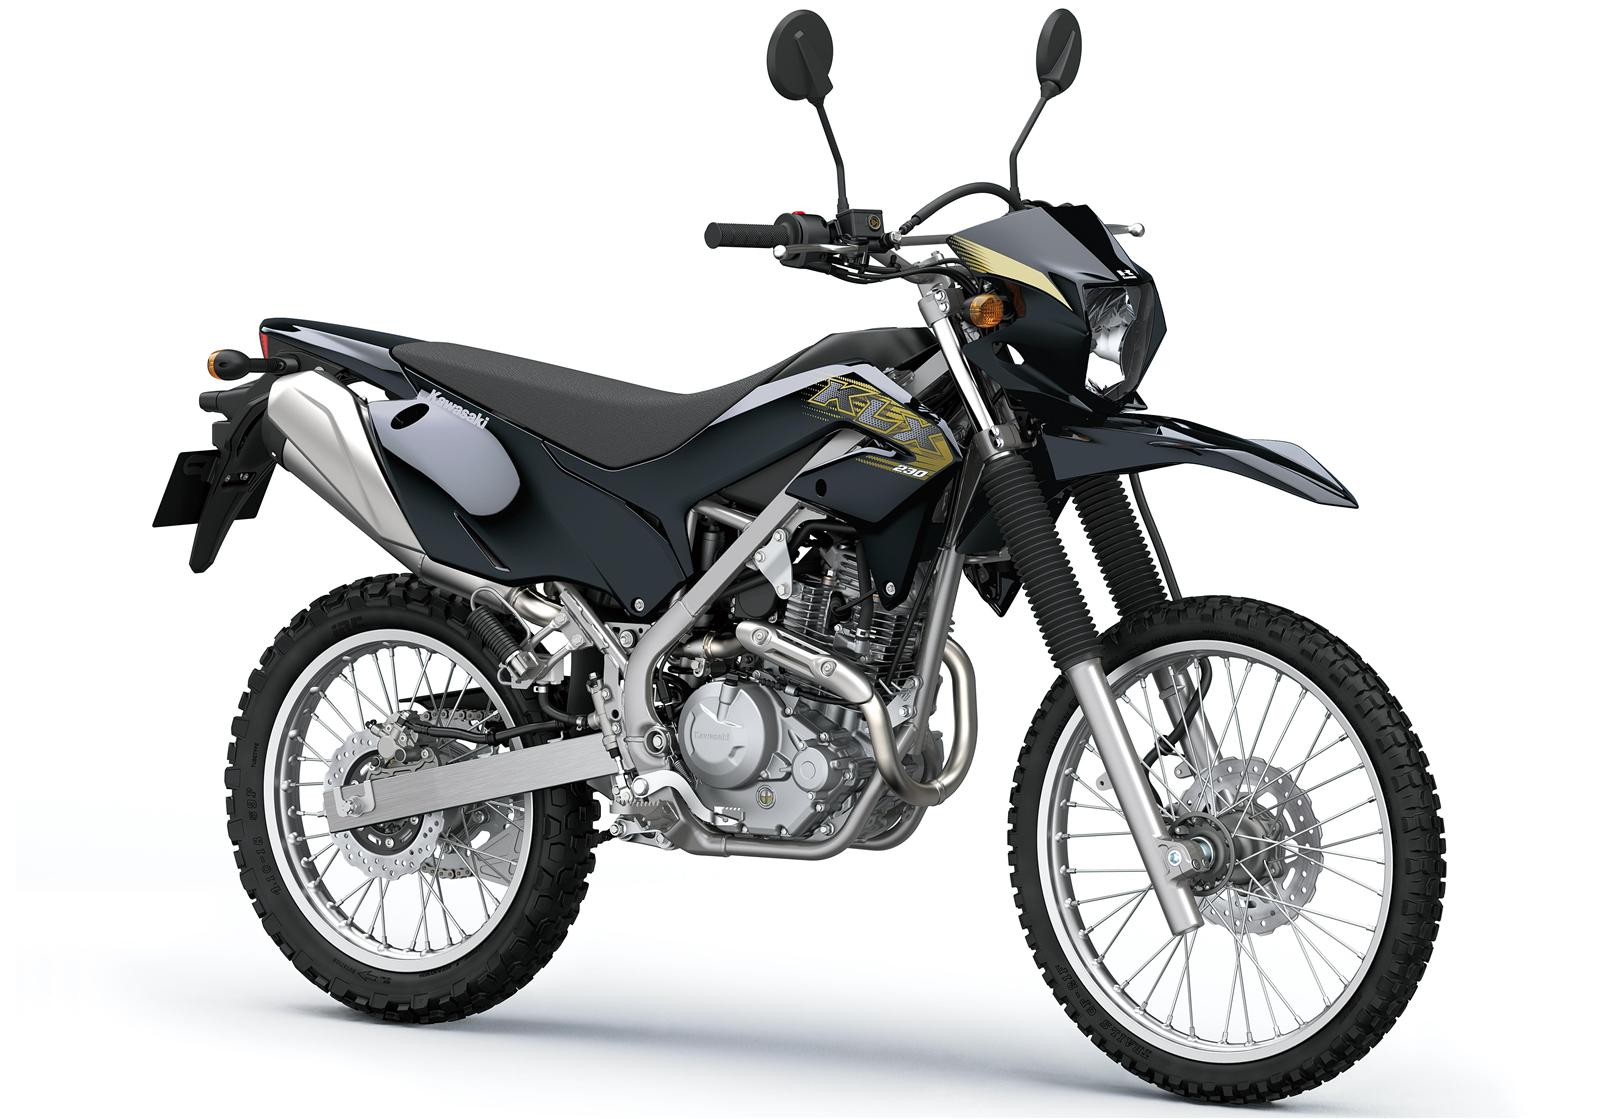 Kawasaki KLX230 malowanie 2020 front